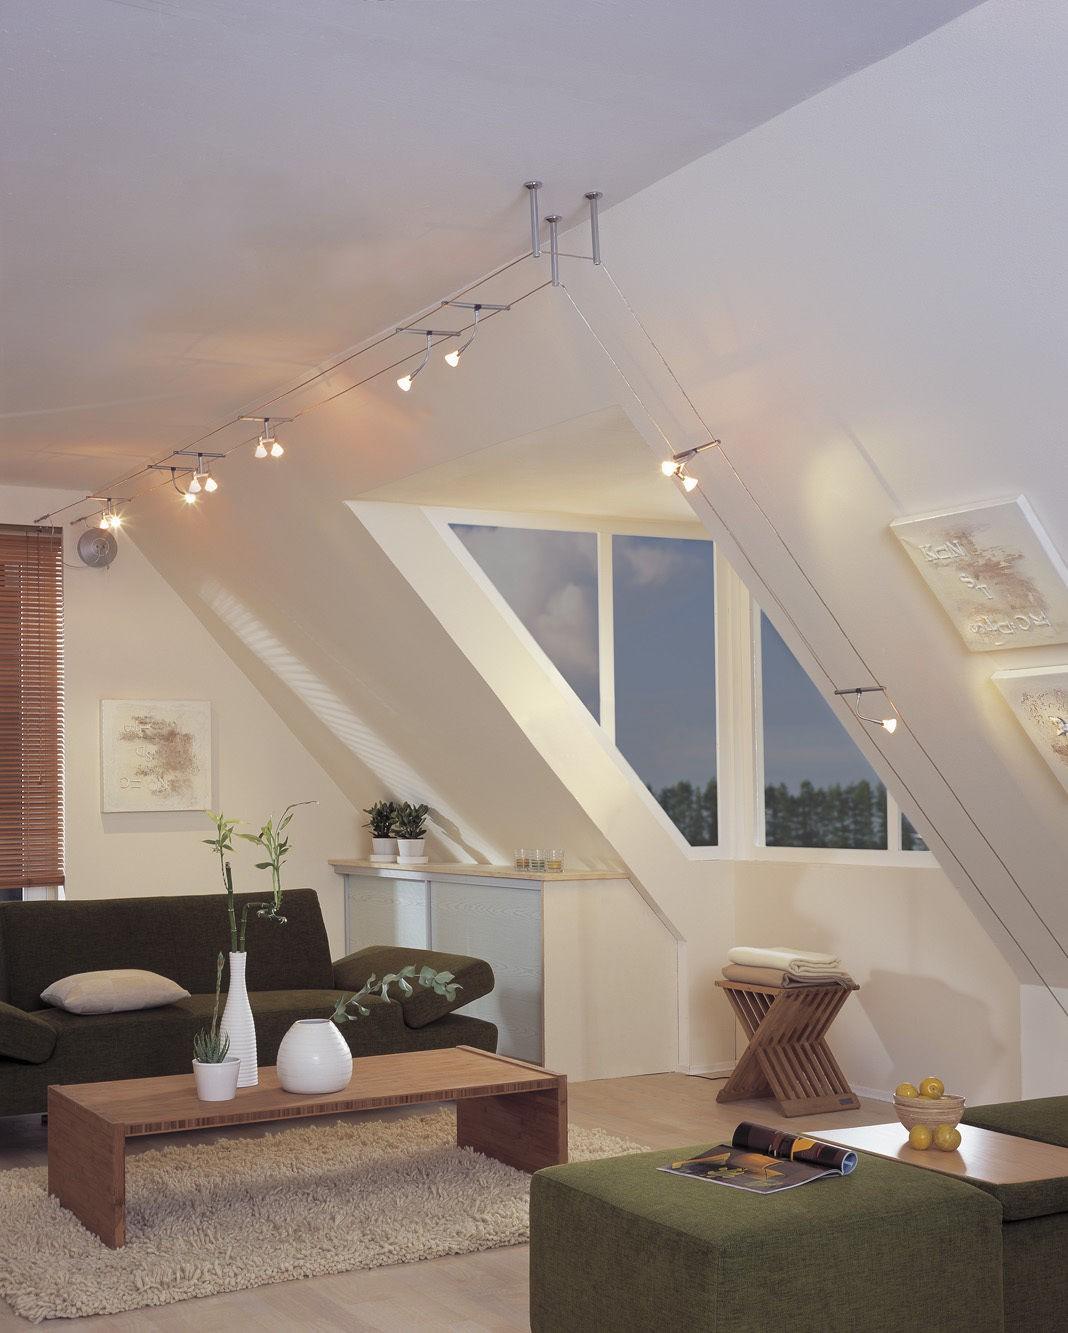 paulmann halogen seil spot 12v seilsystem 160mm seilabstand gu5 3 gu4 g4 ebay. Black Bedroom Furniture Sets. Home Design Ideas